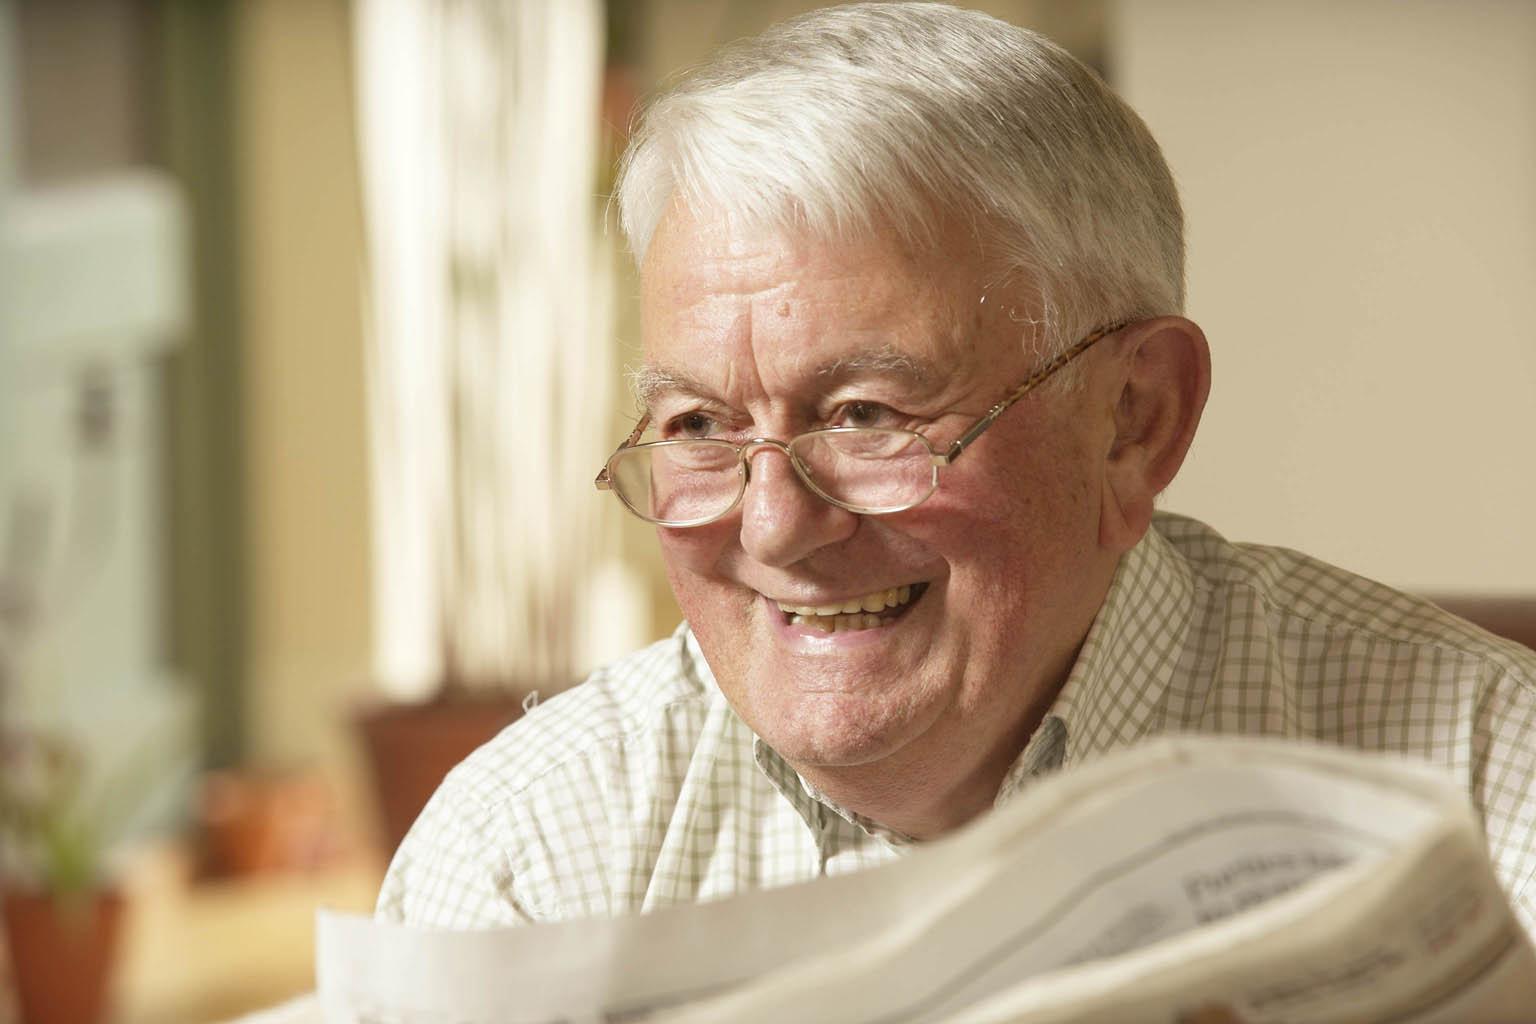 Smiling Senior Man.jpg